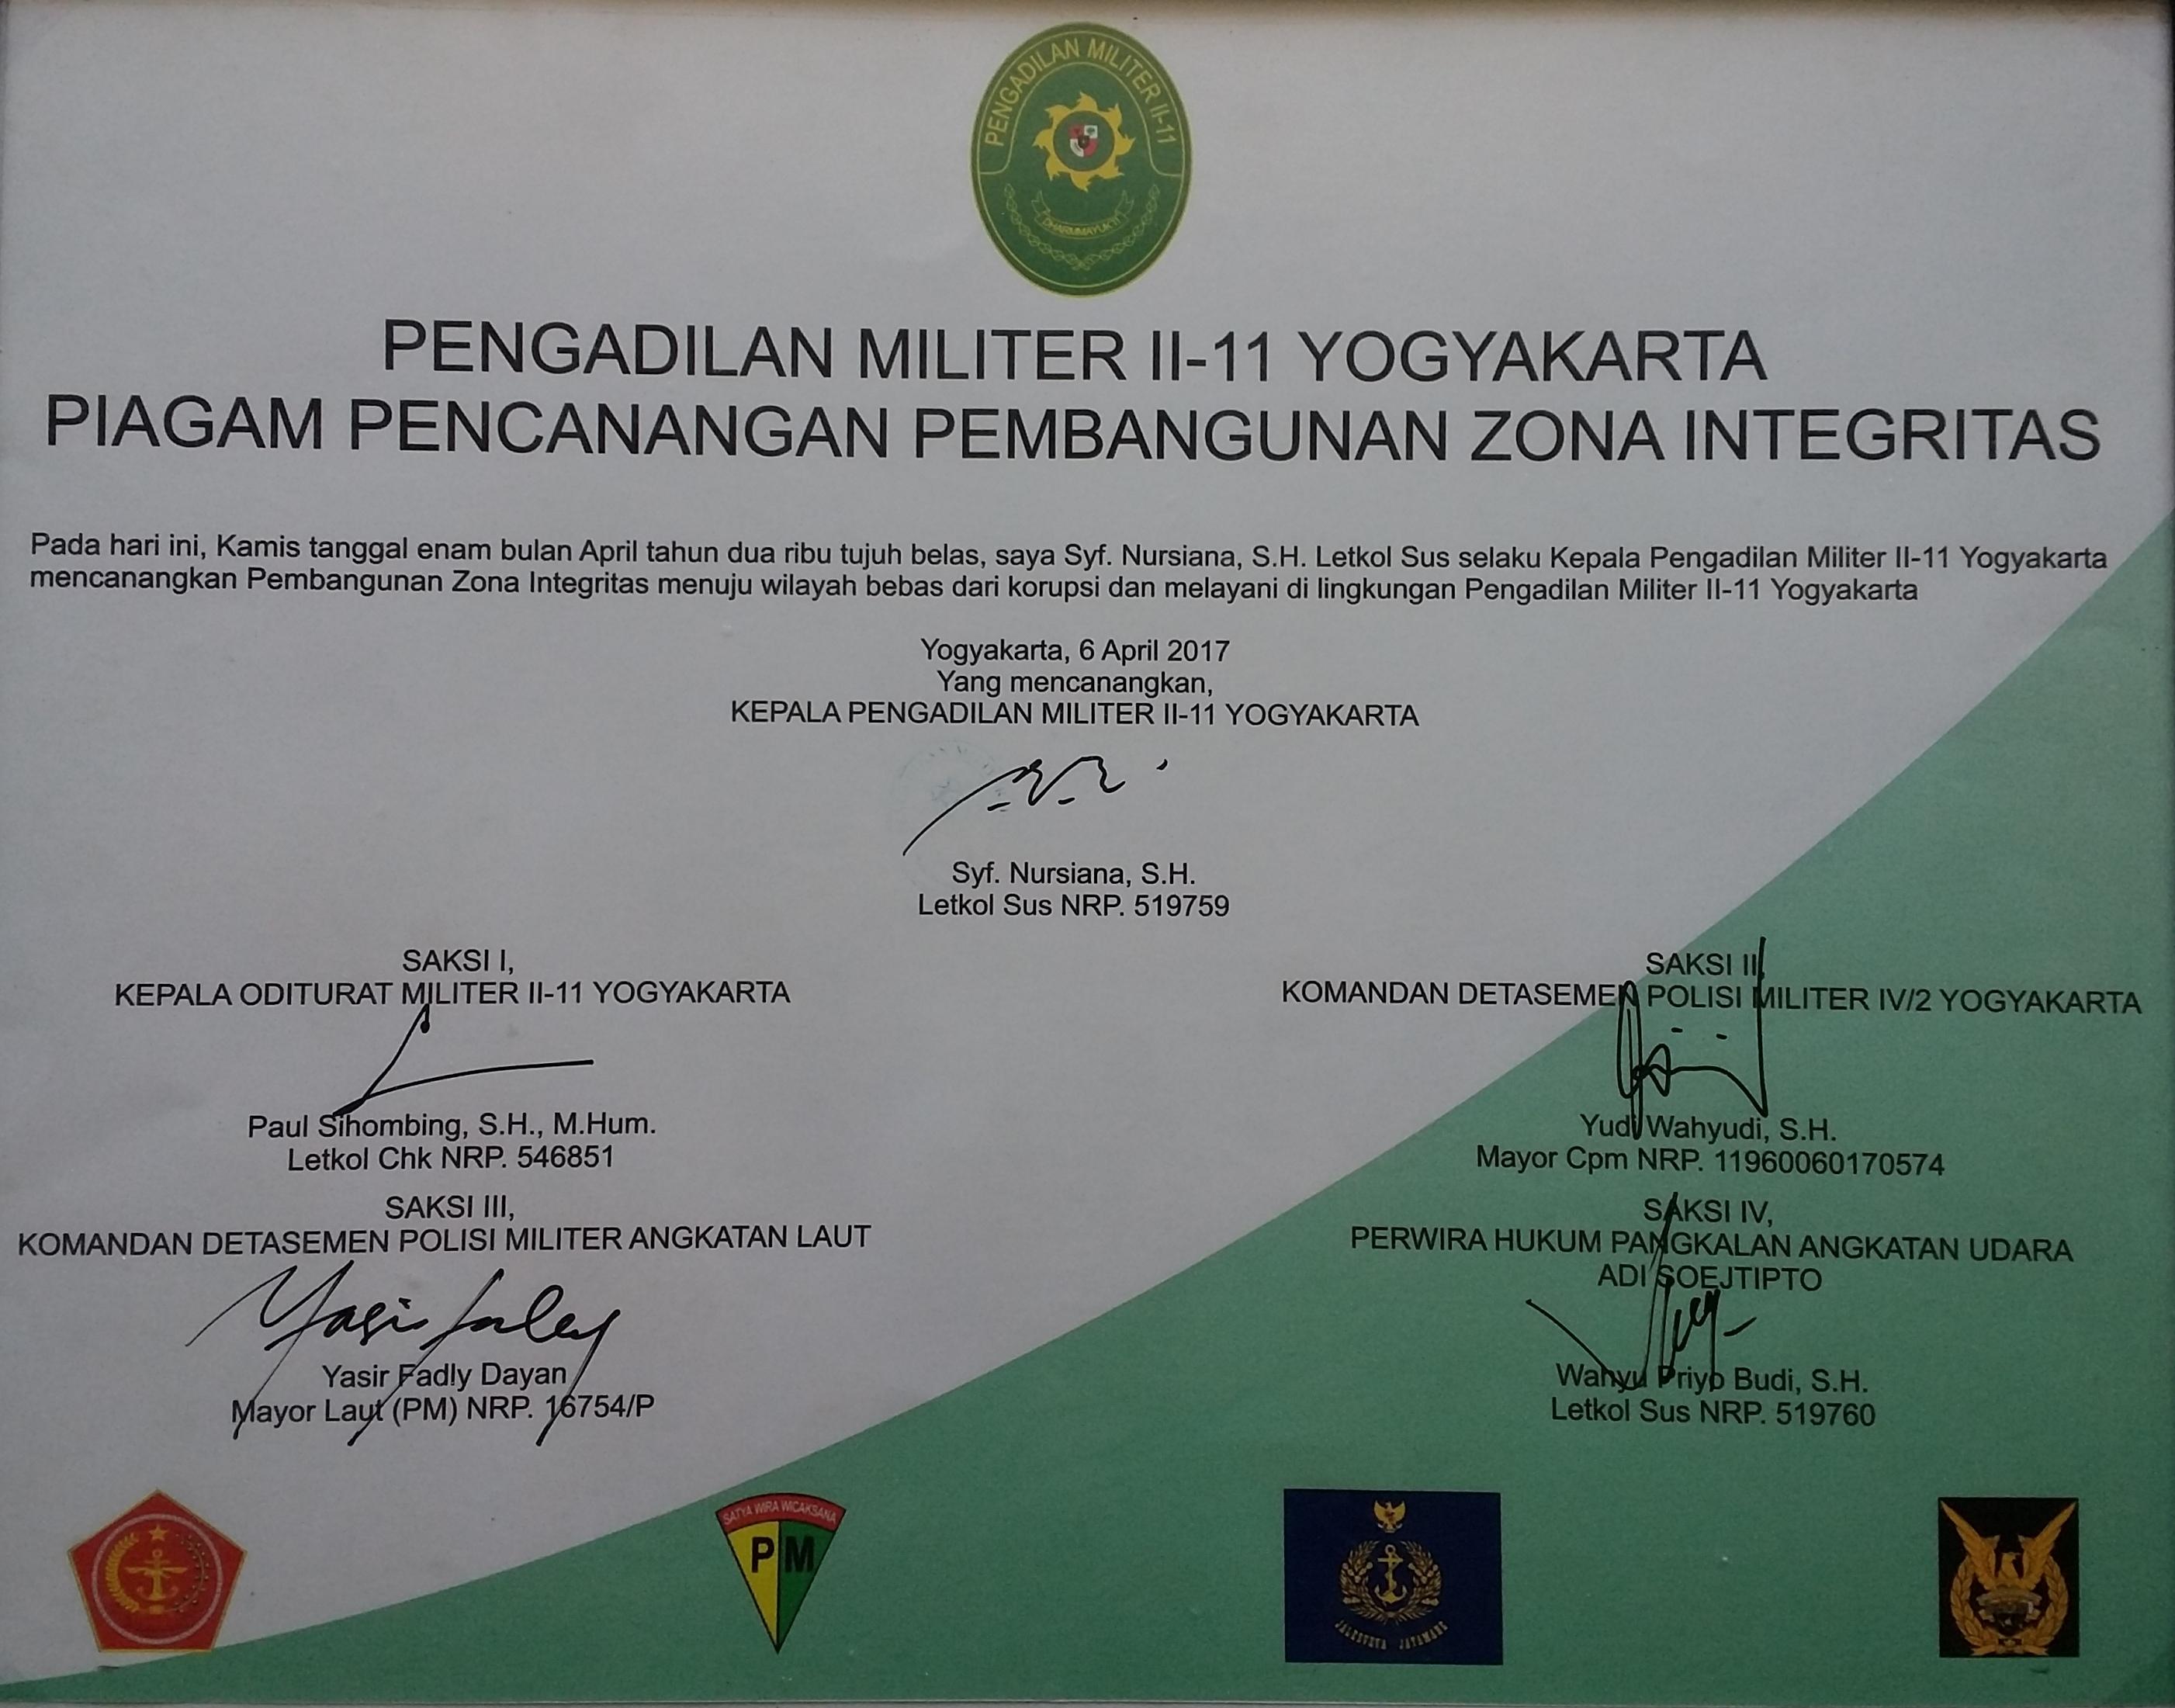 Pencanangan Zona Integritas Pengadilan Militer Ii 11 Yogyakarta